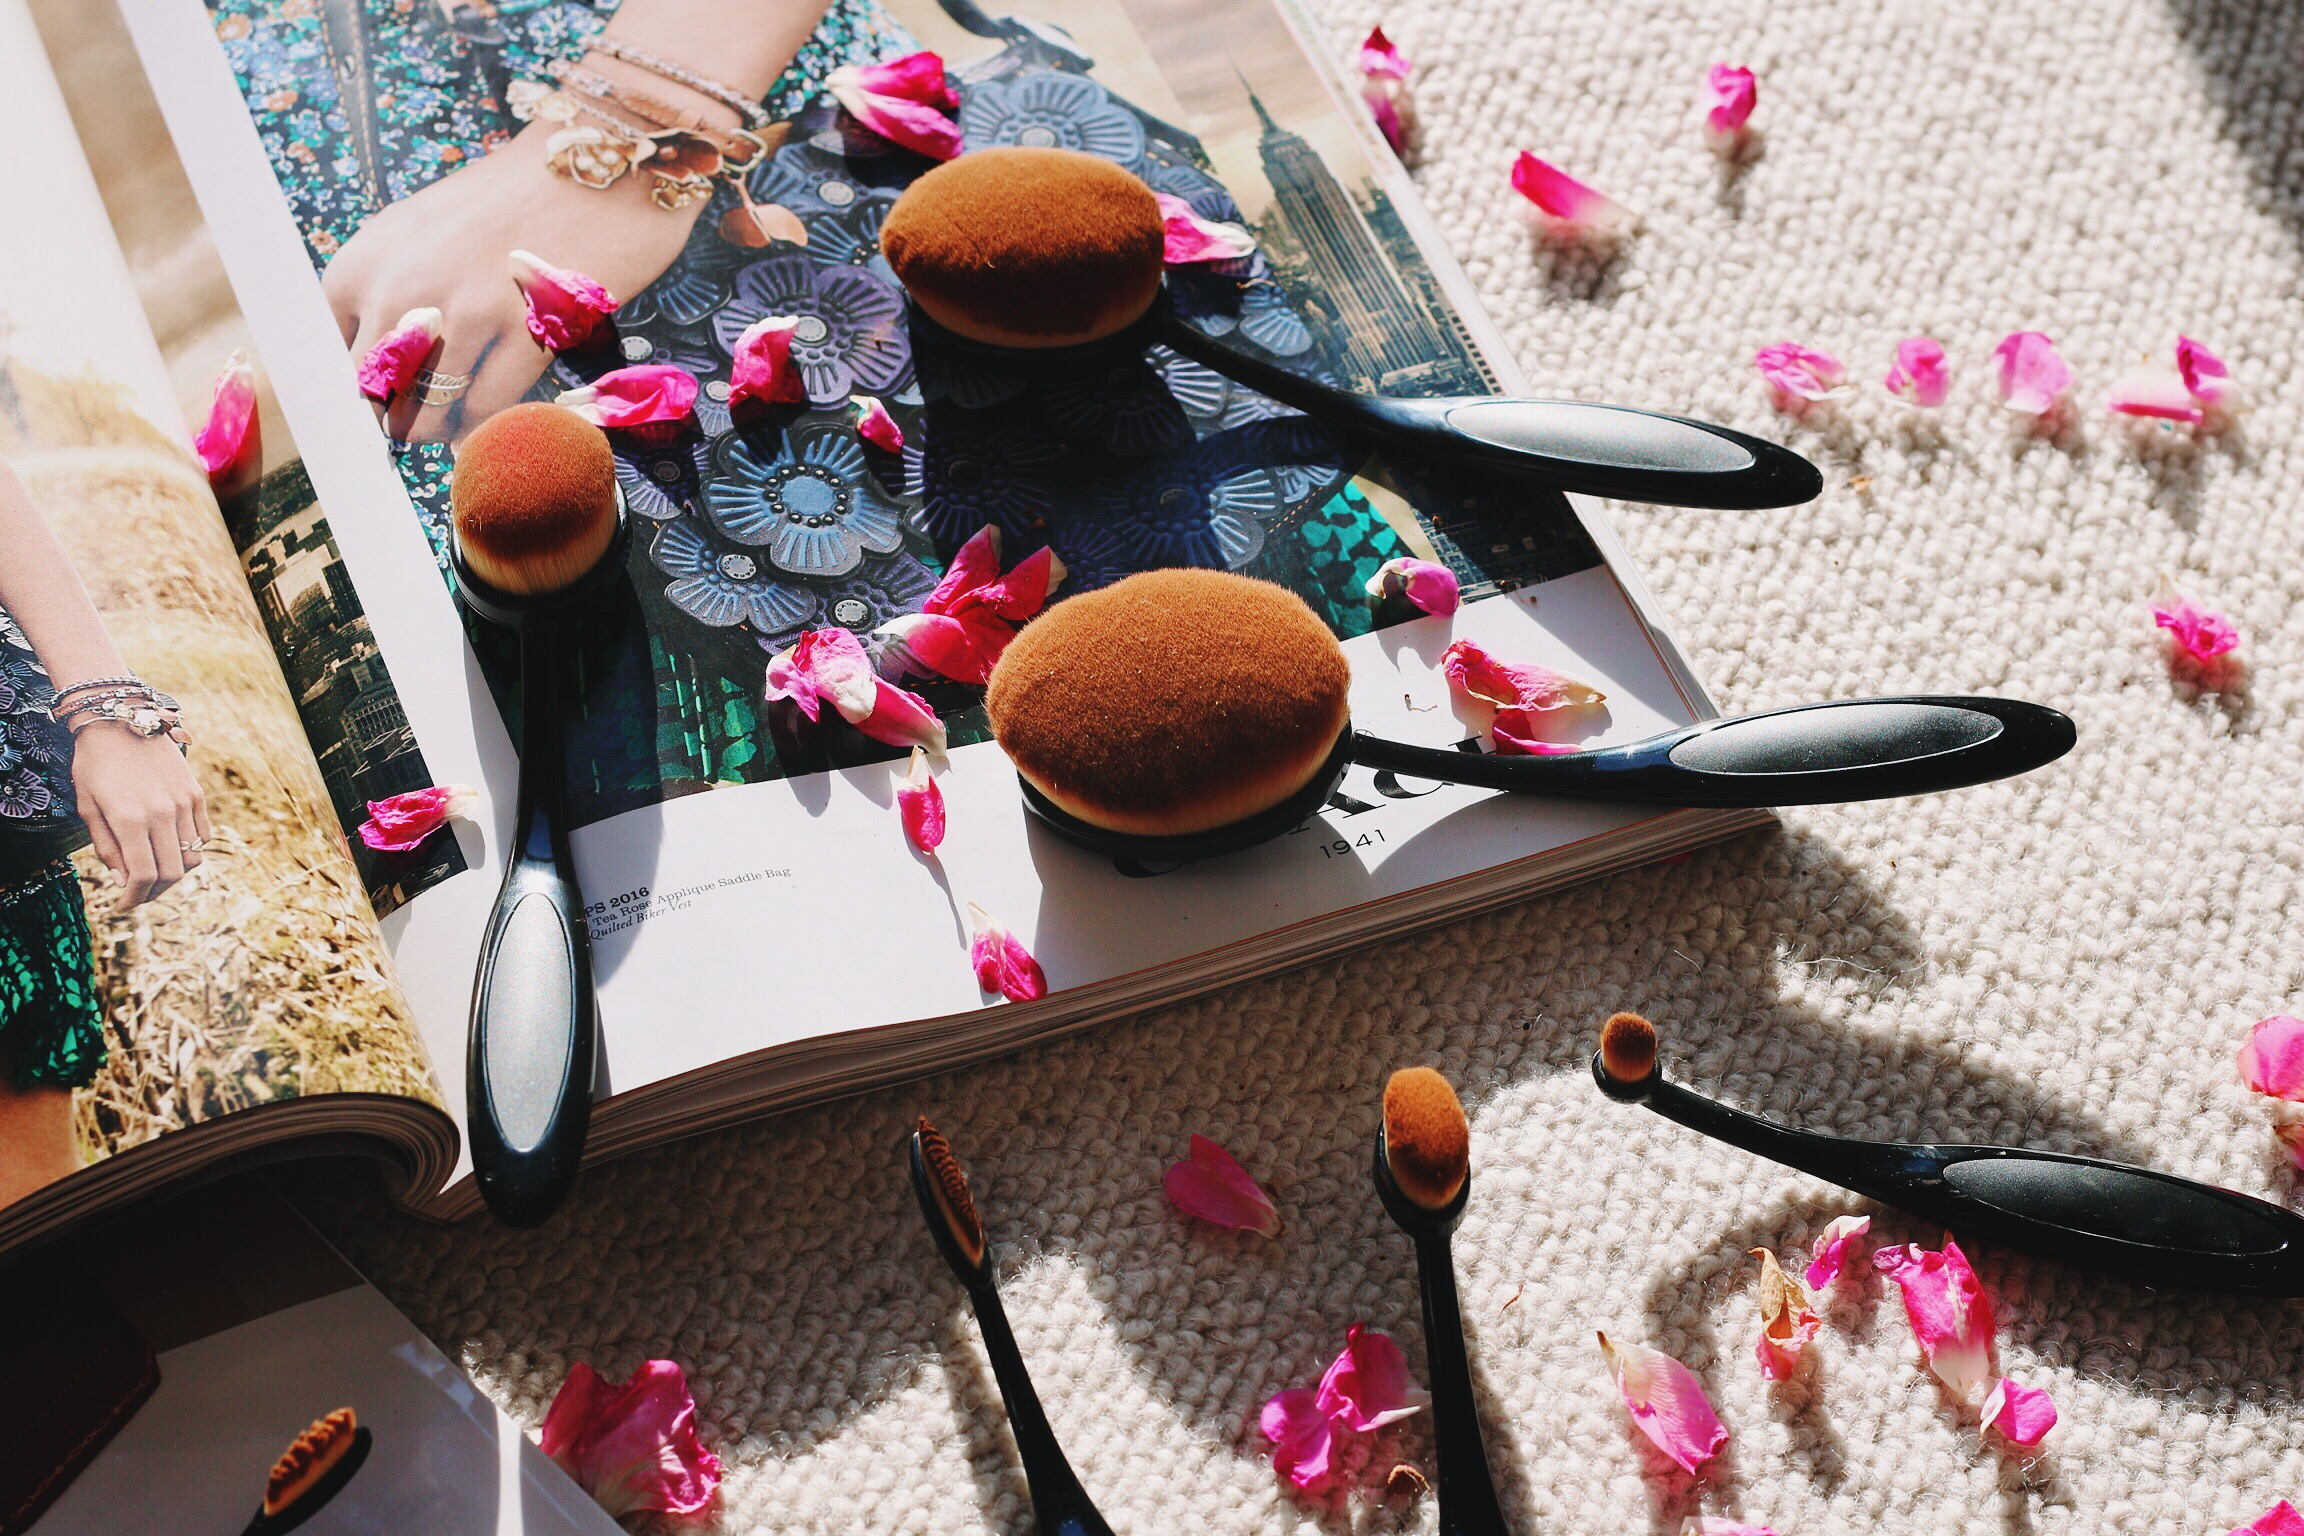 Trysha Gaba - Pinceaux de maquillage ovales dupes artis brush 2